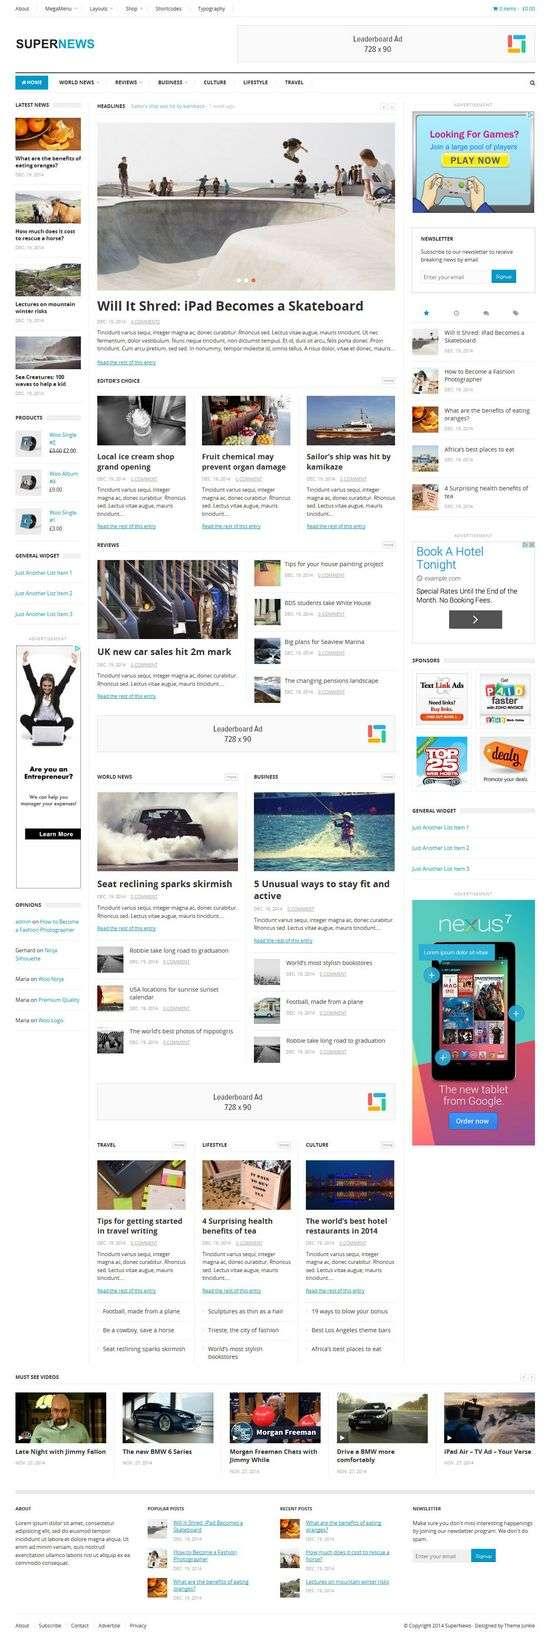 supernews theme junkie 1 - SuperNews WordPress Theme